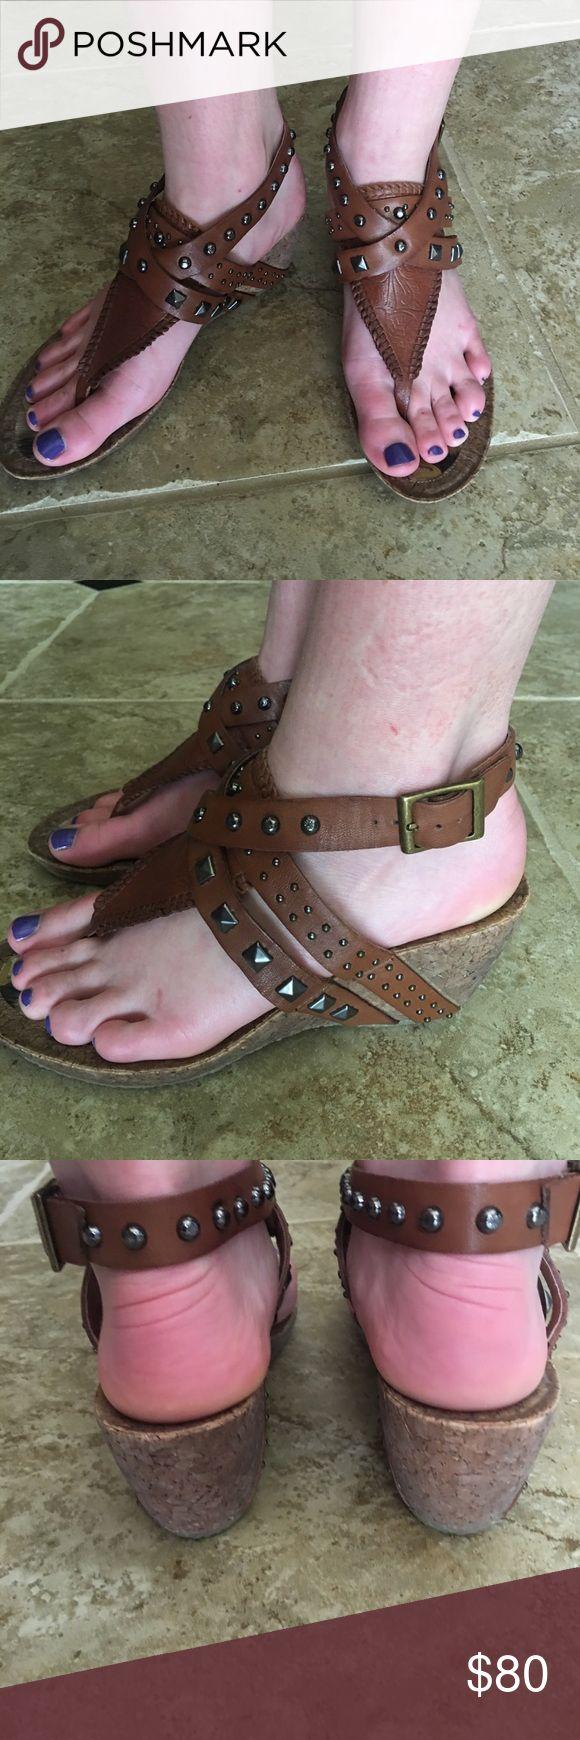 "Ladies wedge sandal Ladies cork wedge studded sandal by Sam Edelman!  2 1/2"" wedge. Never worn, perfect condition! Sam Edelman Shoes Wedges"